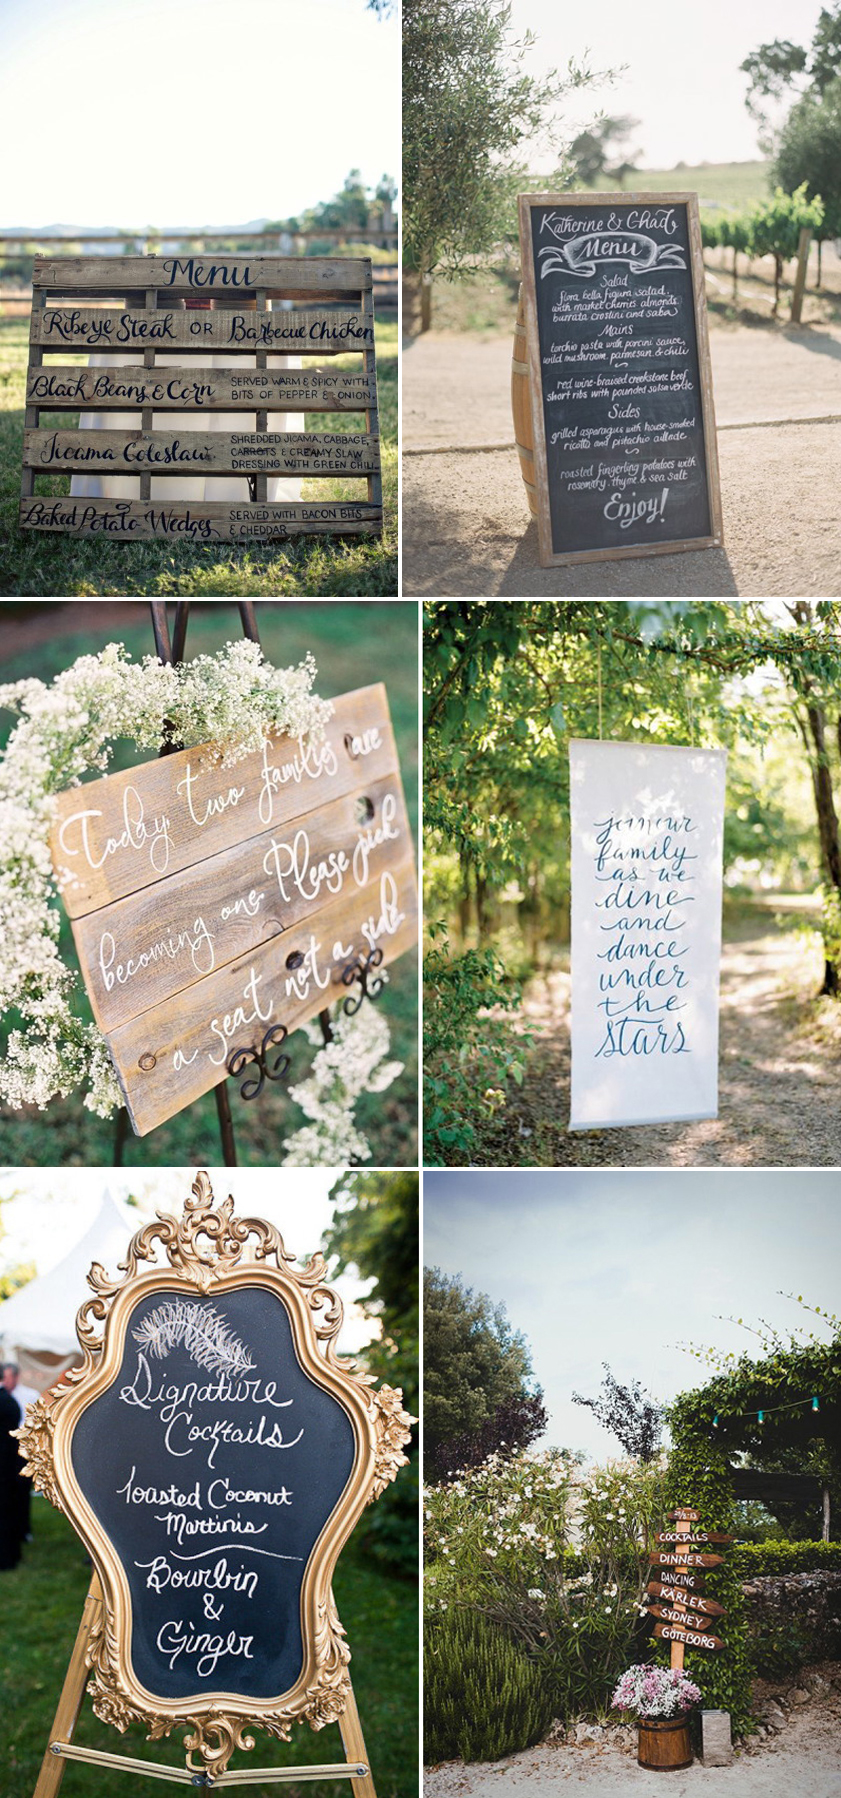 Coco Wedding Venues - Rustic Romance Wedding Style - Signage.